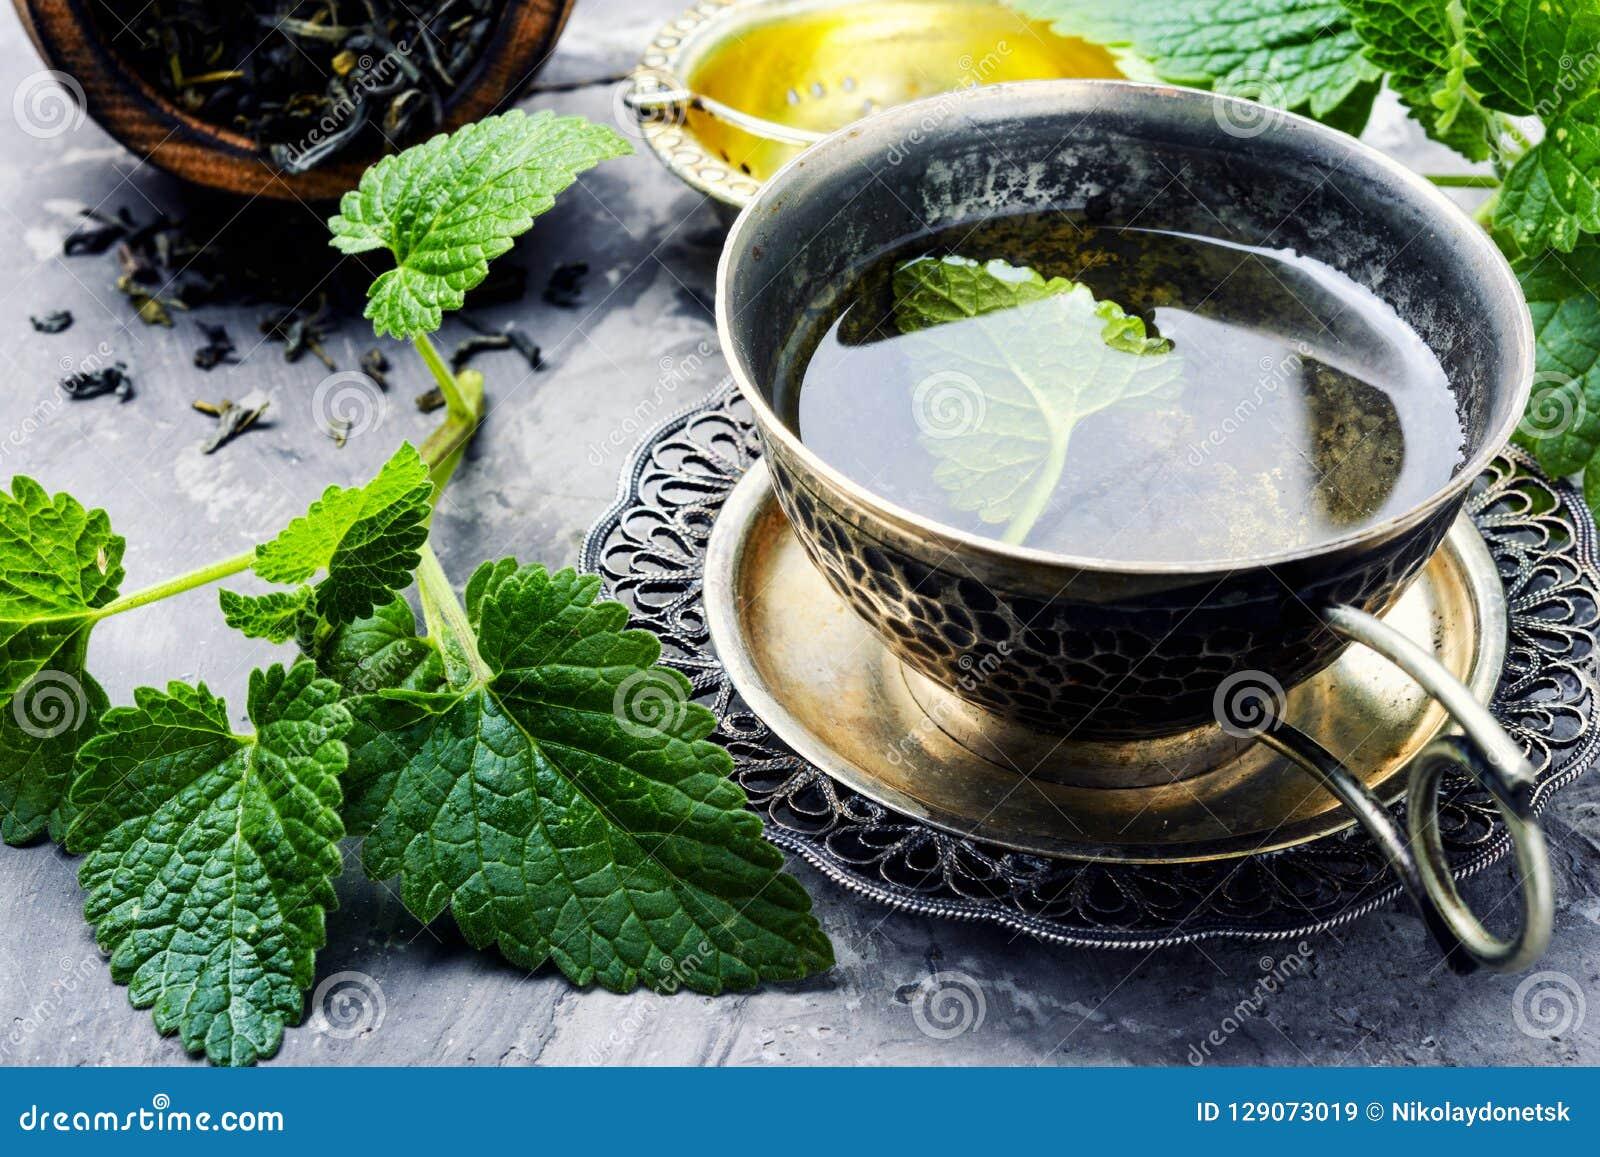 Cup of melissa tea